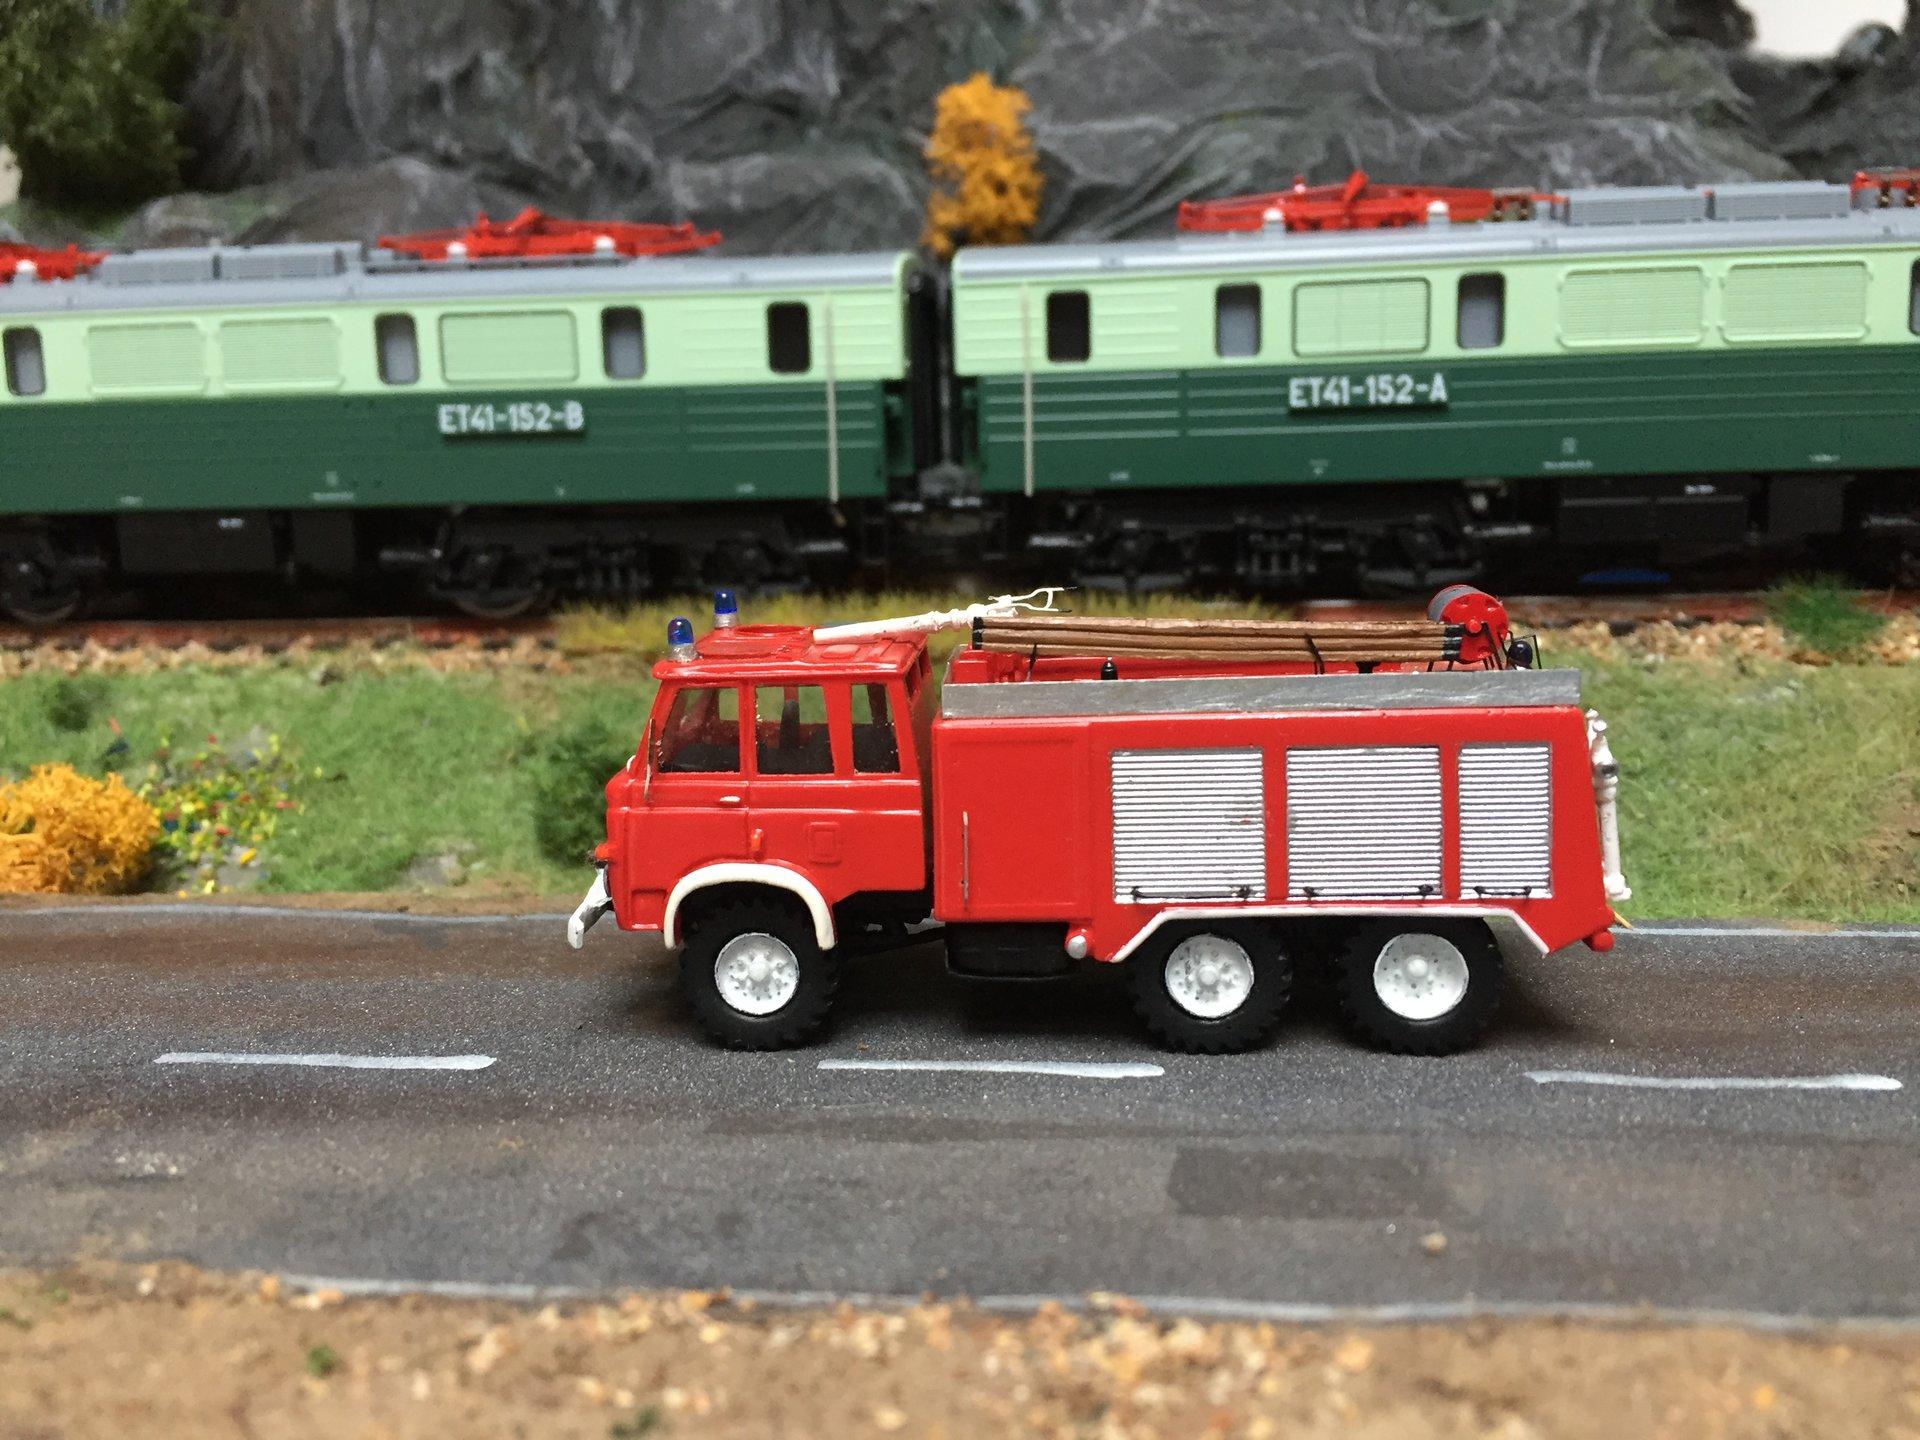 DB598761-6E3E-4764-B195-C398873A283E.jpeg